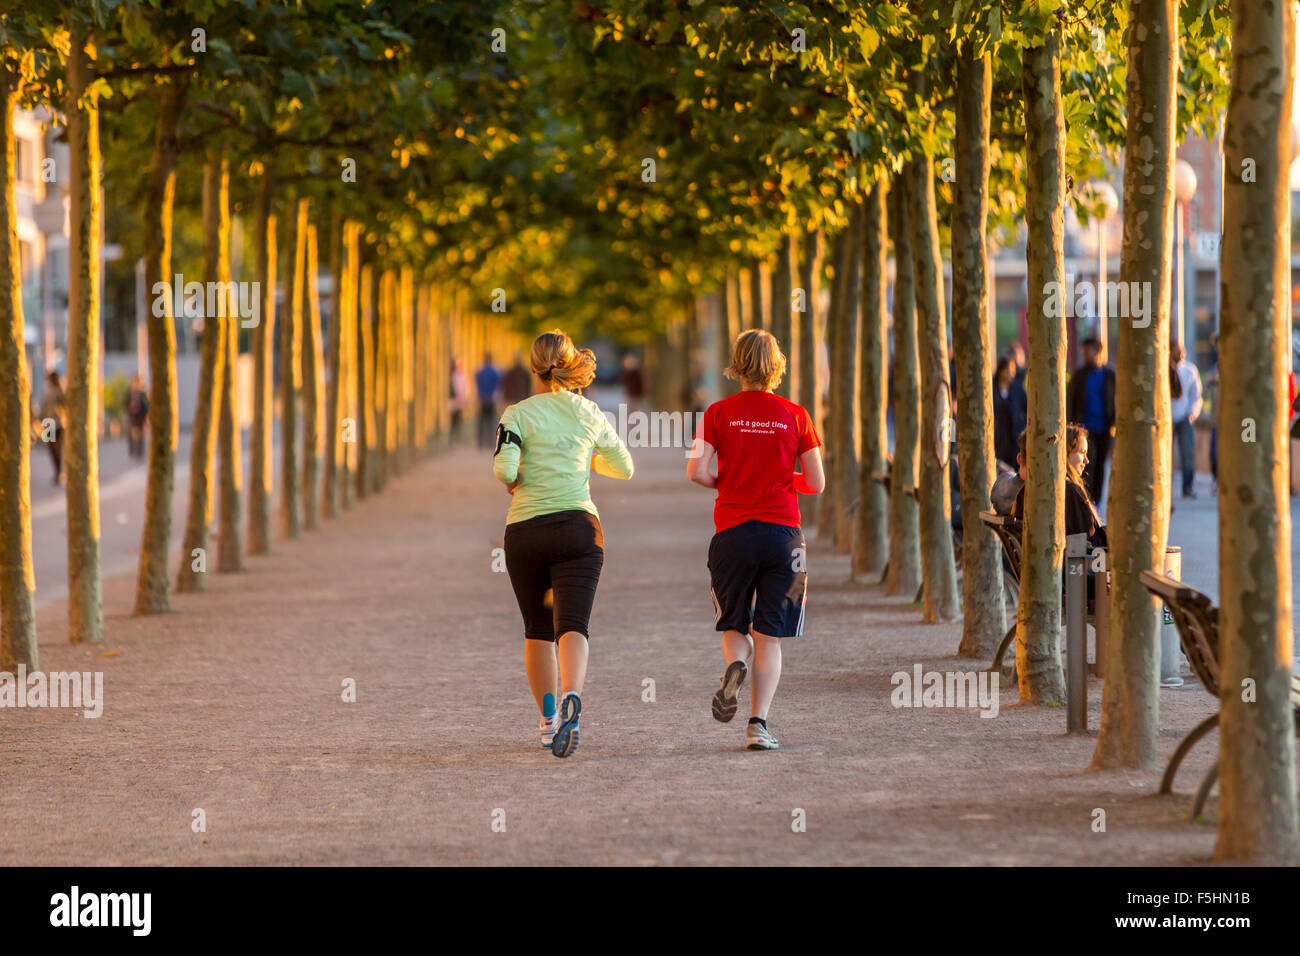 Jogger at Rhine promenade, Düsseldorf, Germany - Stock Image